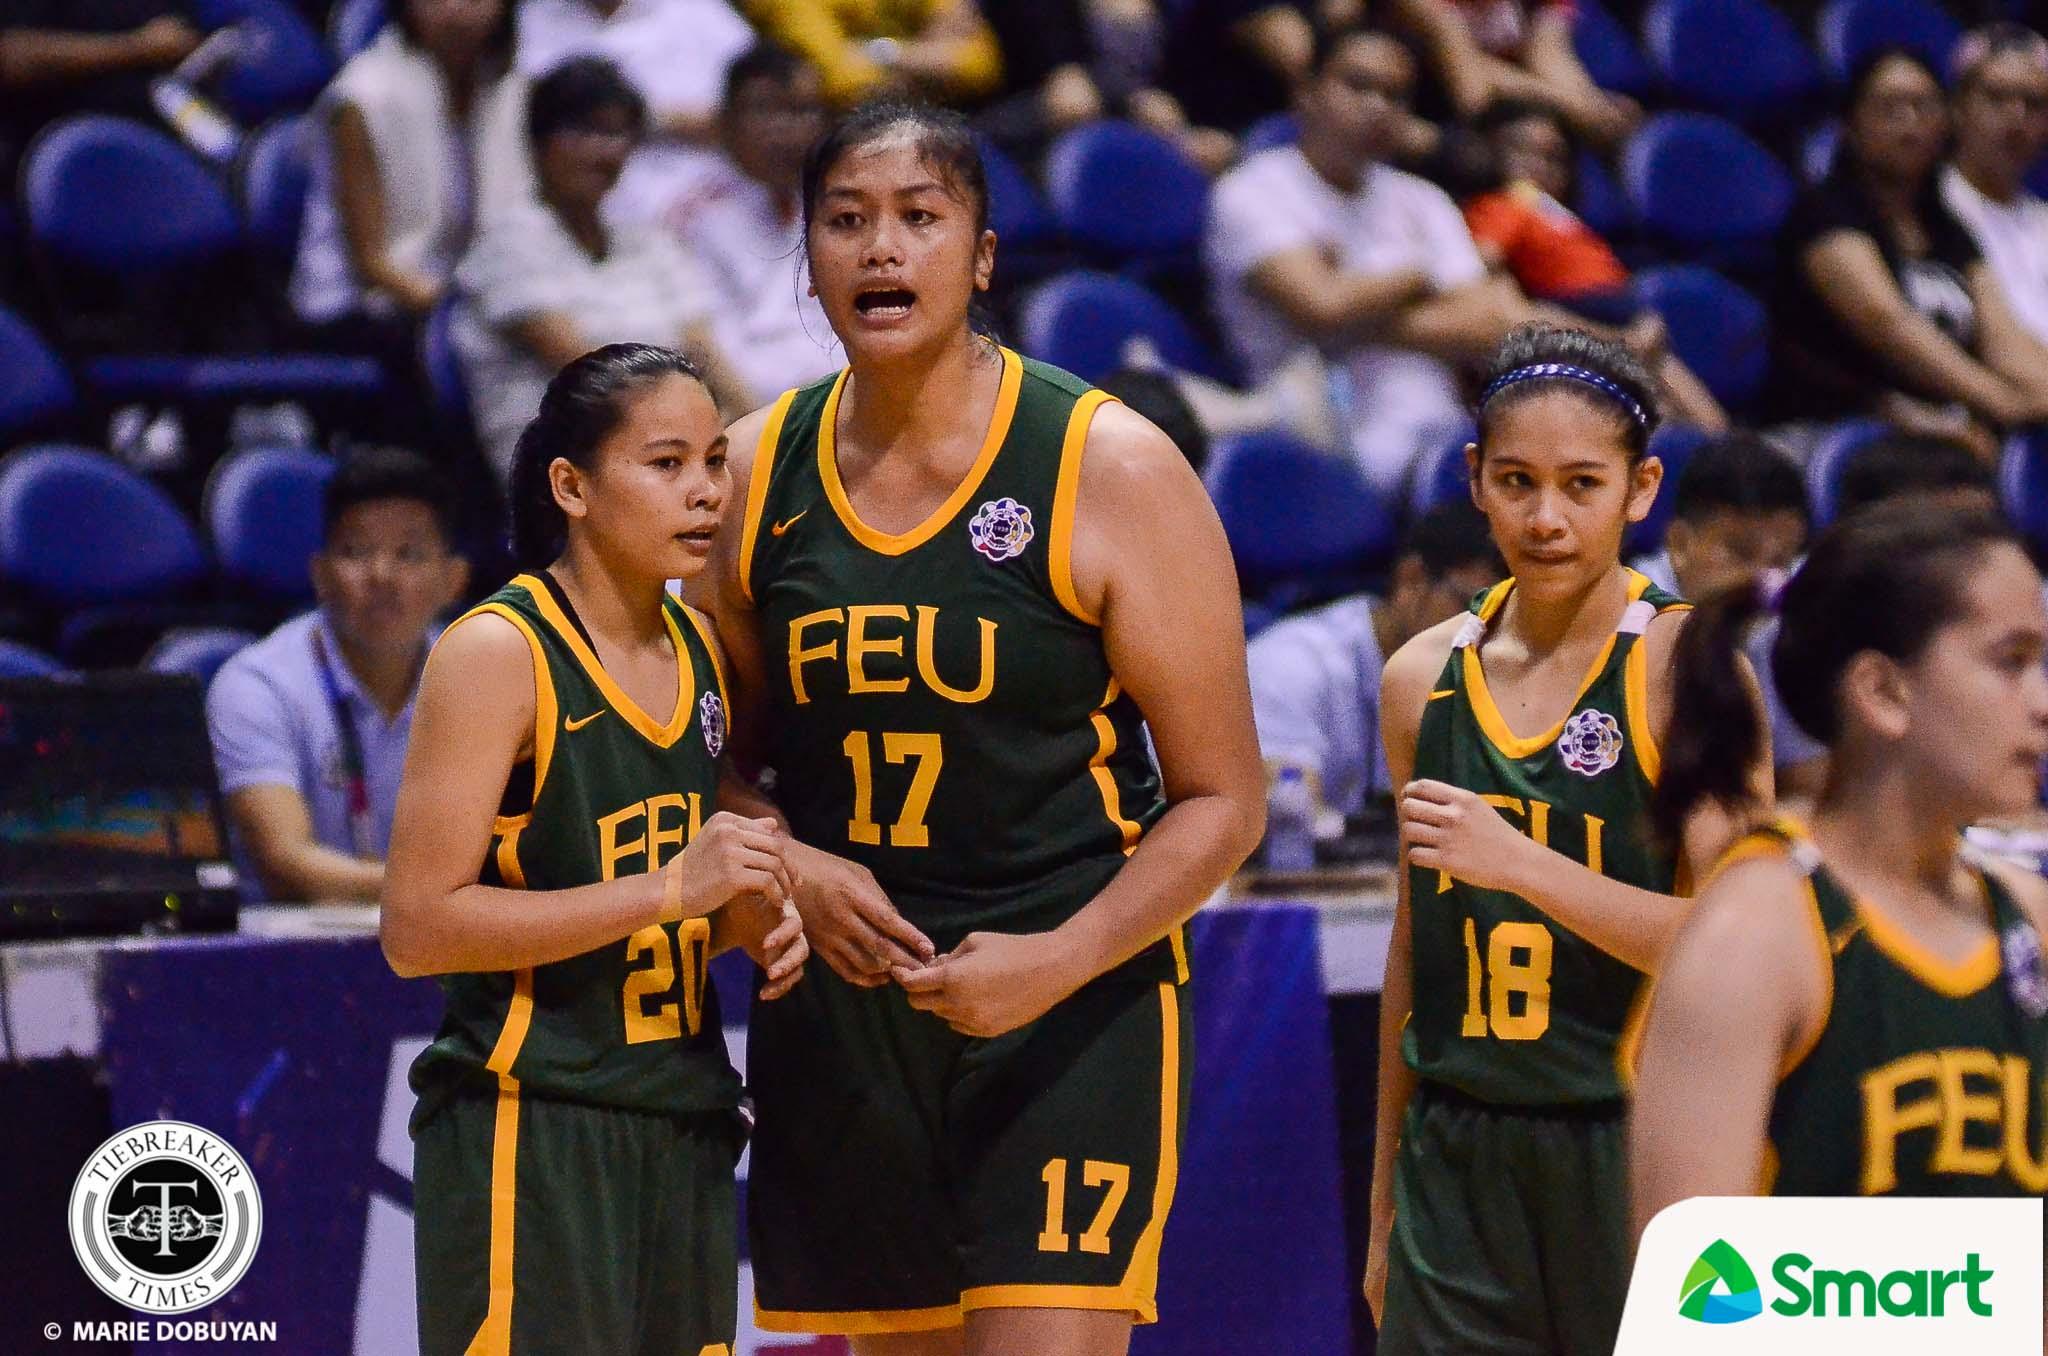 Tiebreaker Times Clare Castro hopes FEU overcomes 'problems' to extend her career Basketball FEU News UAAP  UAAP Season 82 Women's Basketball UAAP Season 82 FEU Women's Basketball Clare Castro